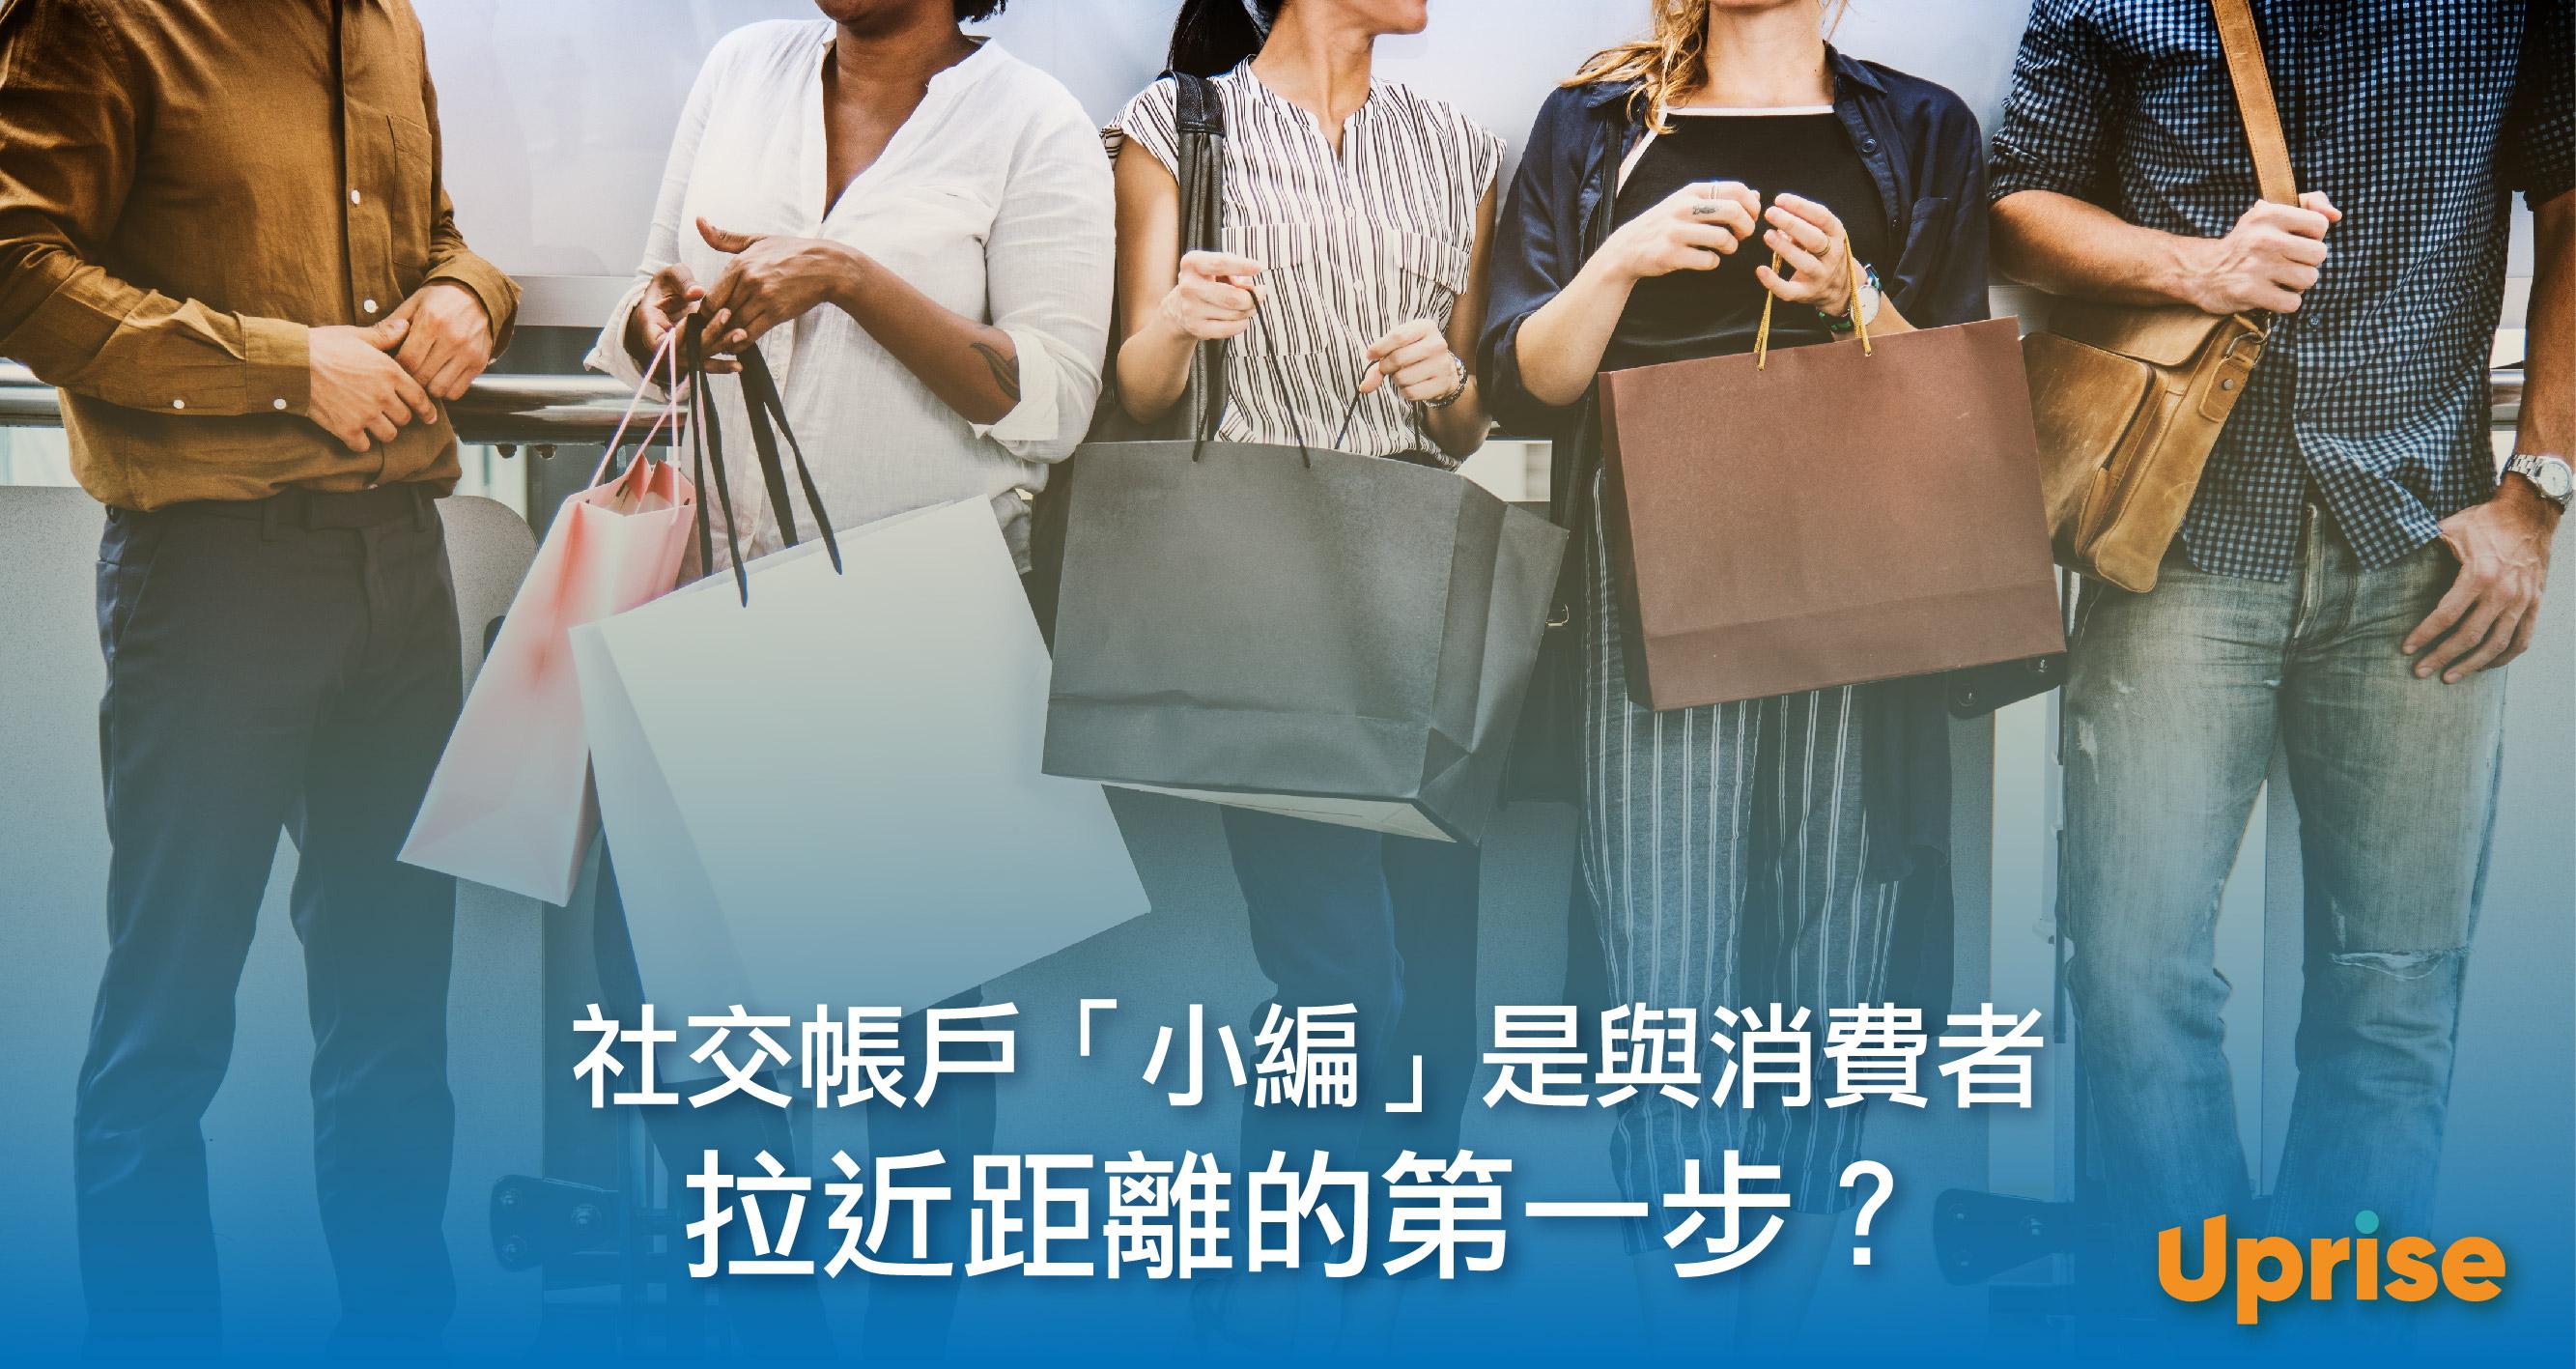 Uprise - Business Insights - 【社交帳戶「小編」是與消費者拉近距離的第一步?】